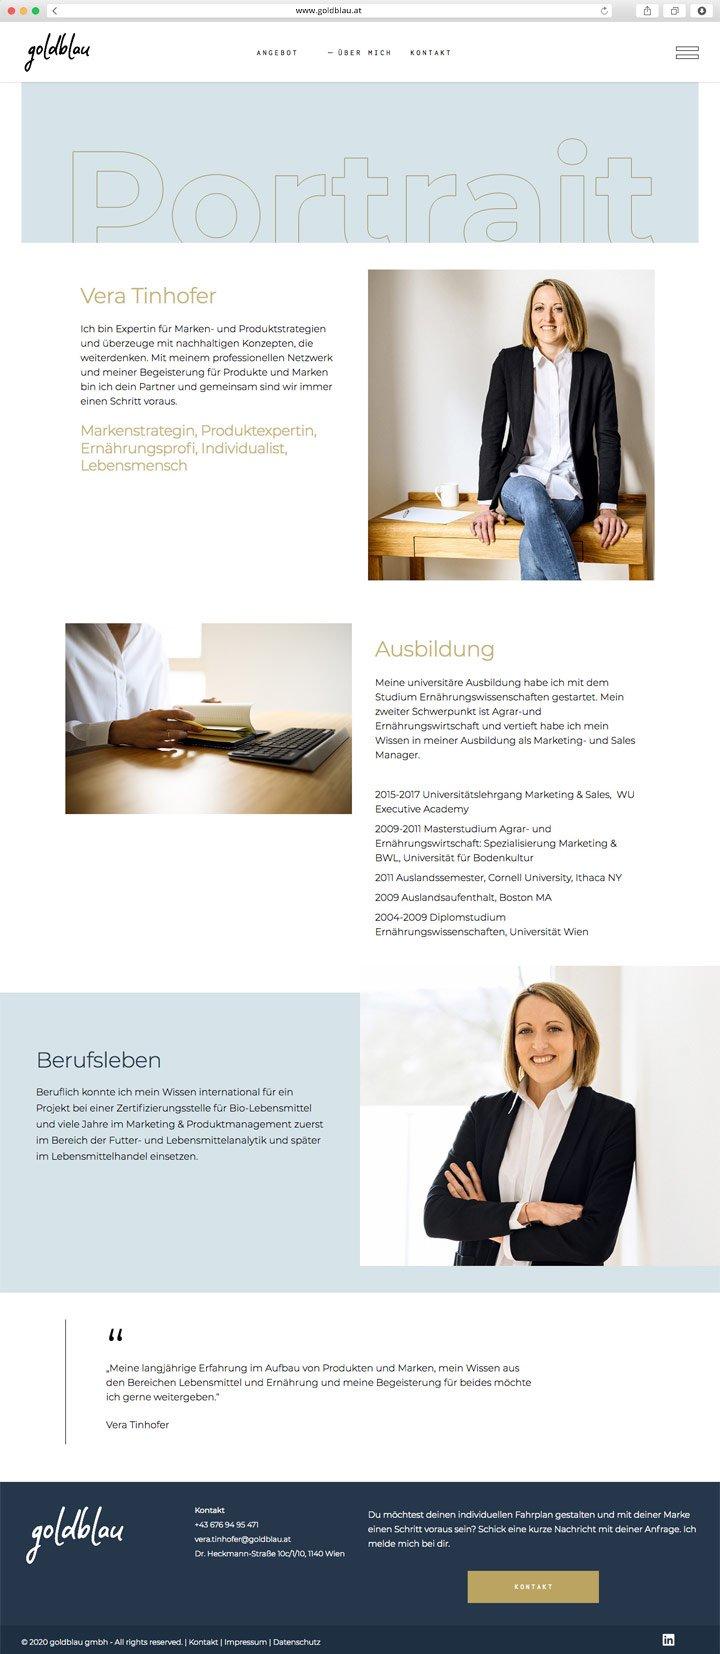 Goldblau Website Screenshot